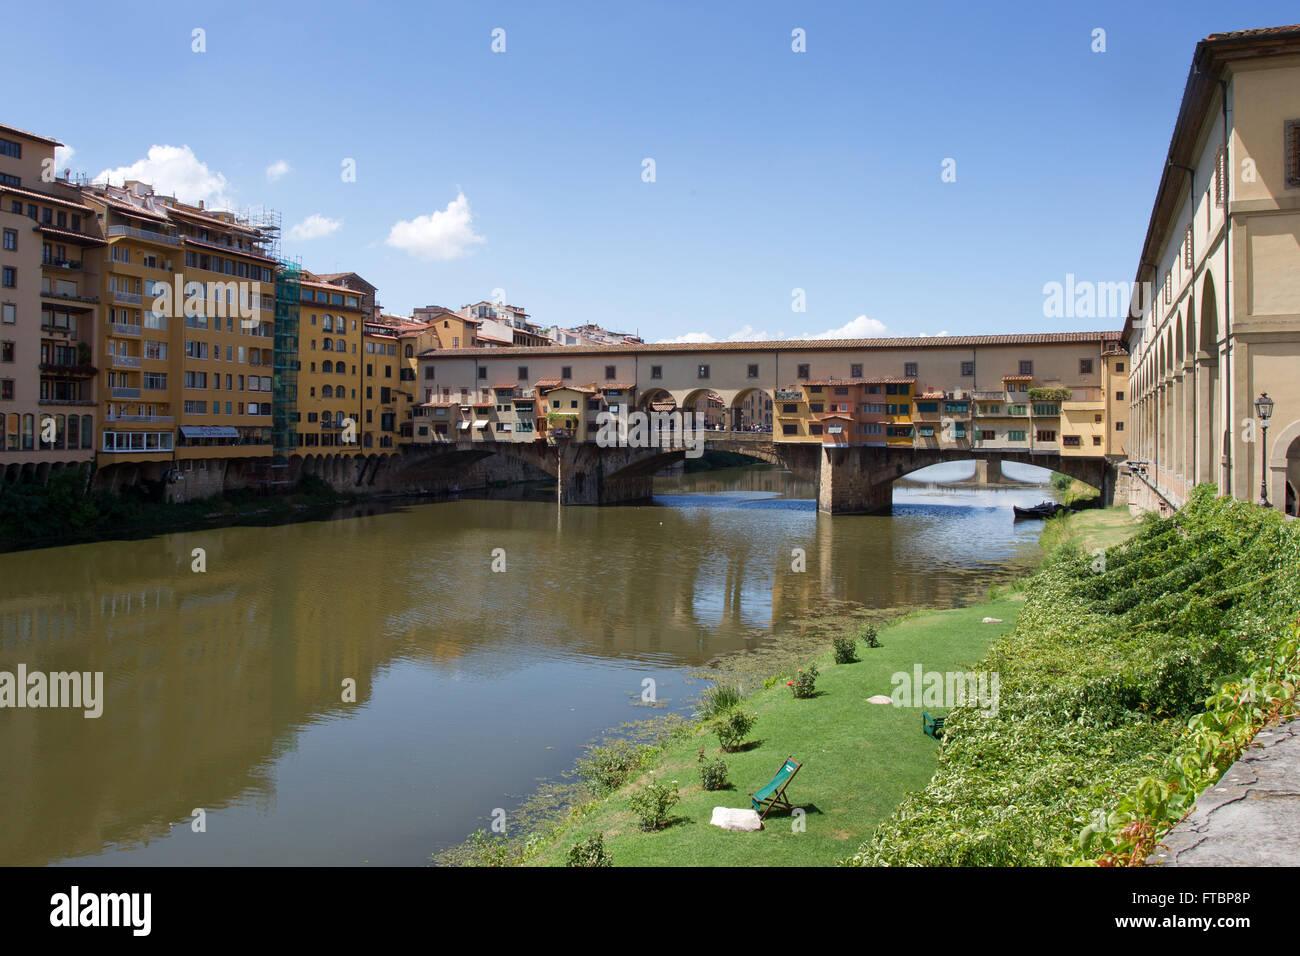 The Ponte Vecchio, Florence, Italy. - Stock Image